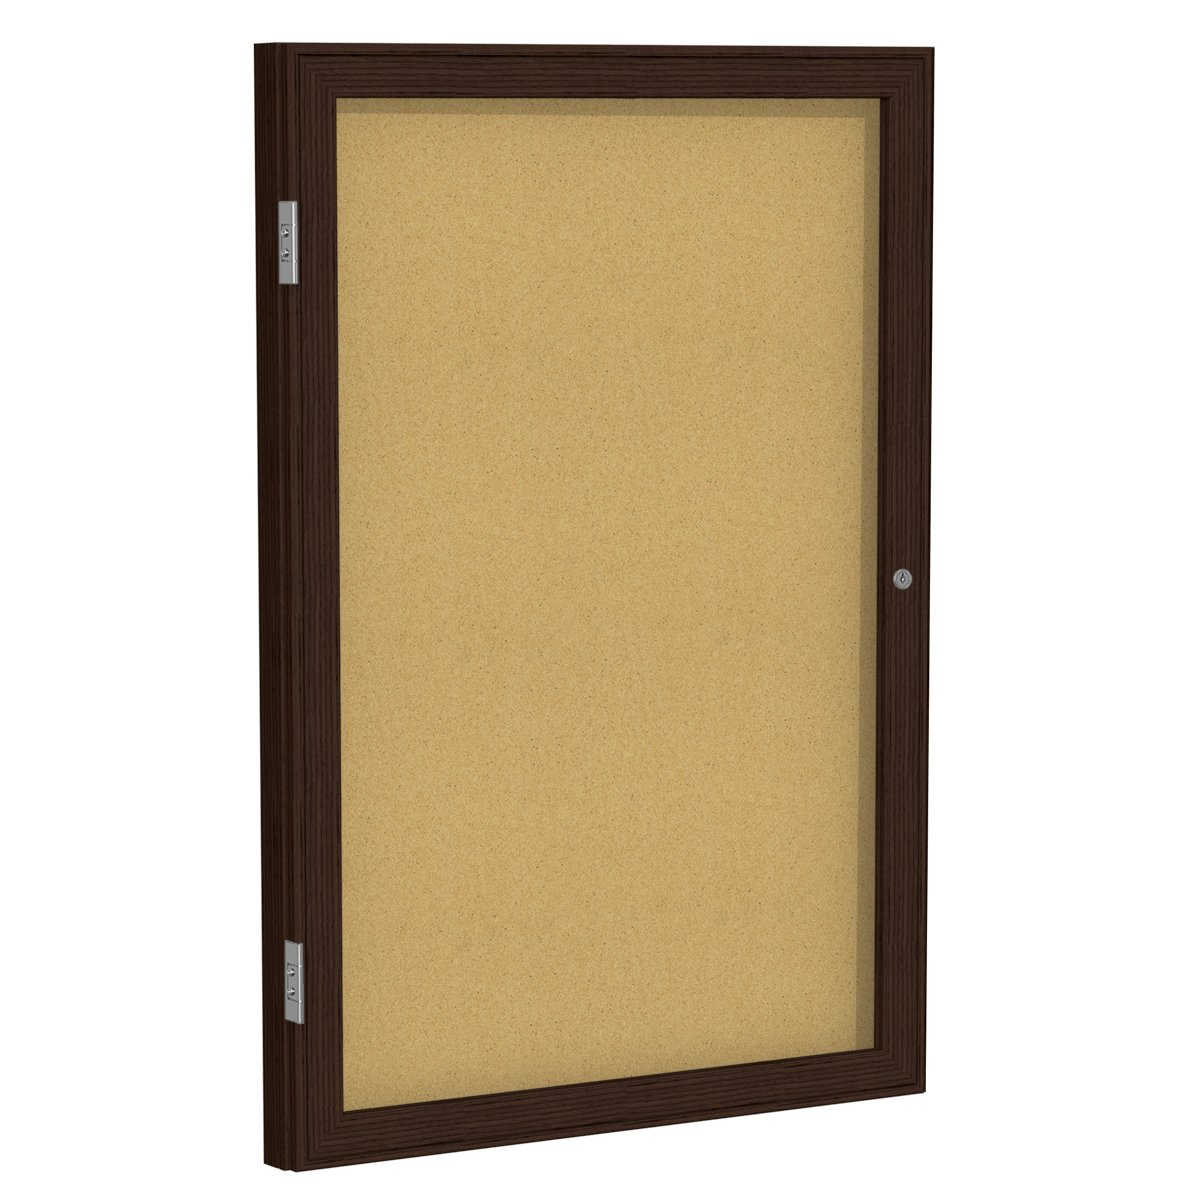 Ghent 24'' x 18'' Wood Frame Walnut Finish Enclosed Bulletin Board, Natural Cork (PN12418K) by Ghent